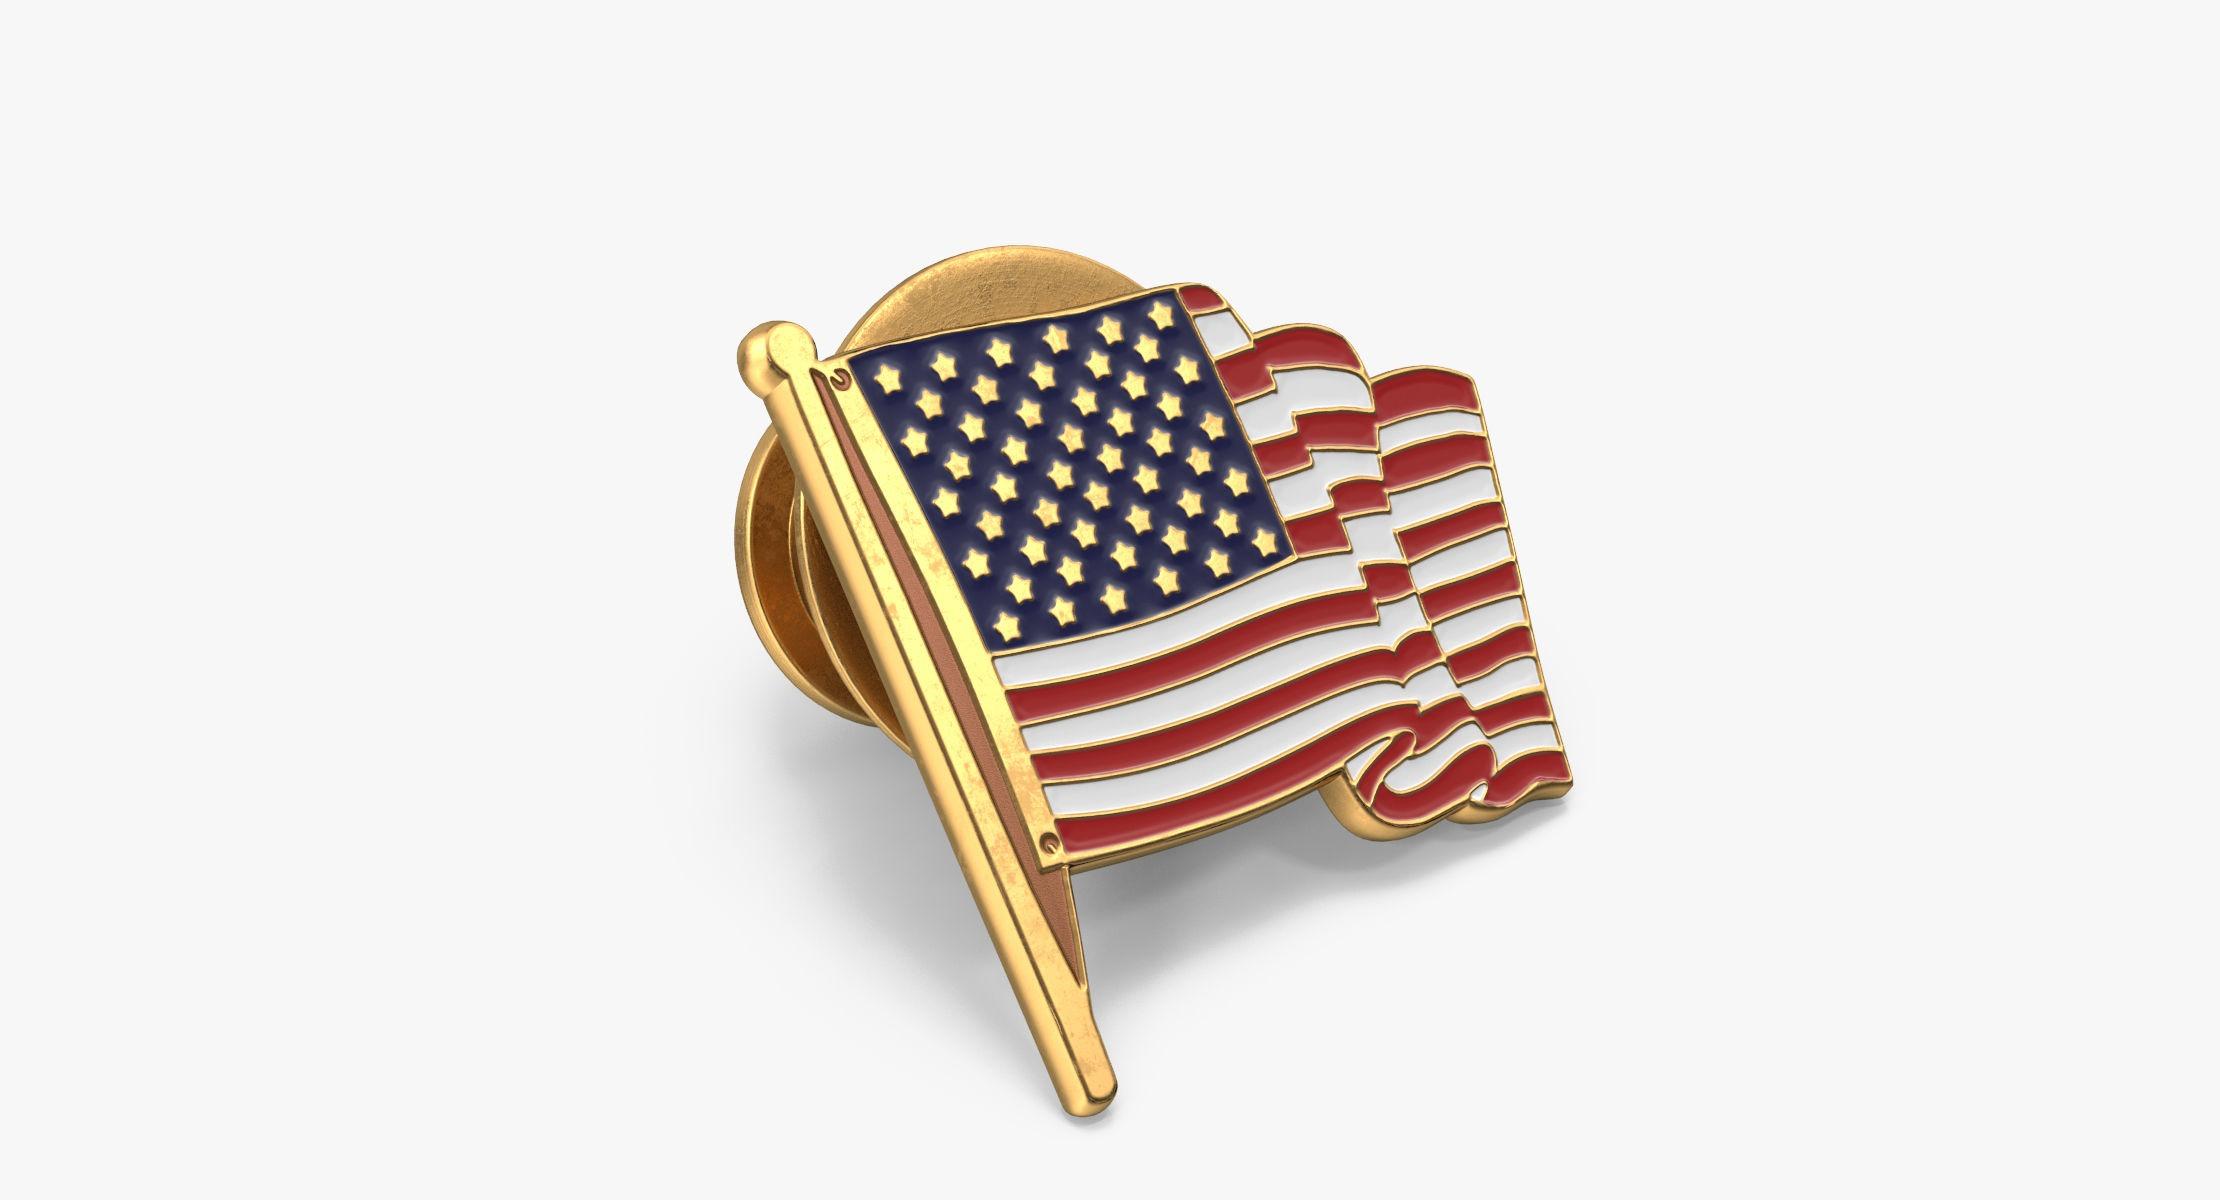 American Flag Pin - reel 1